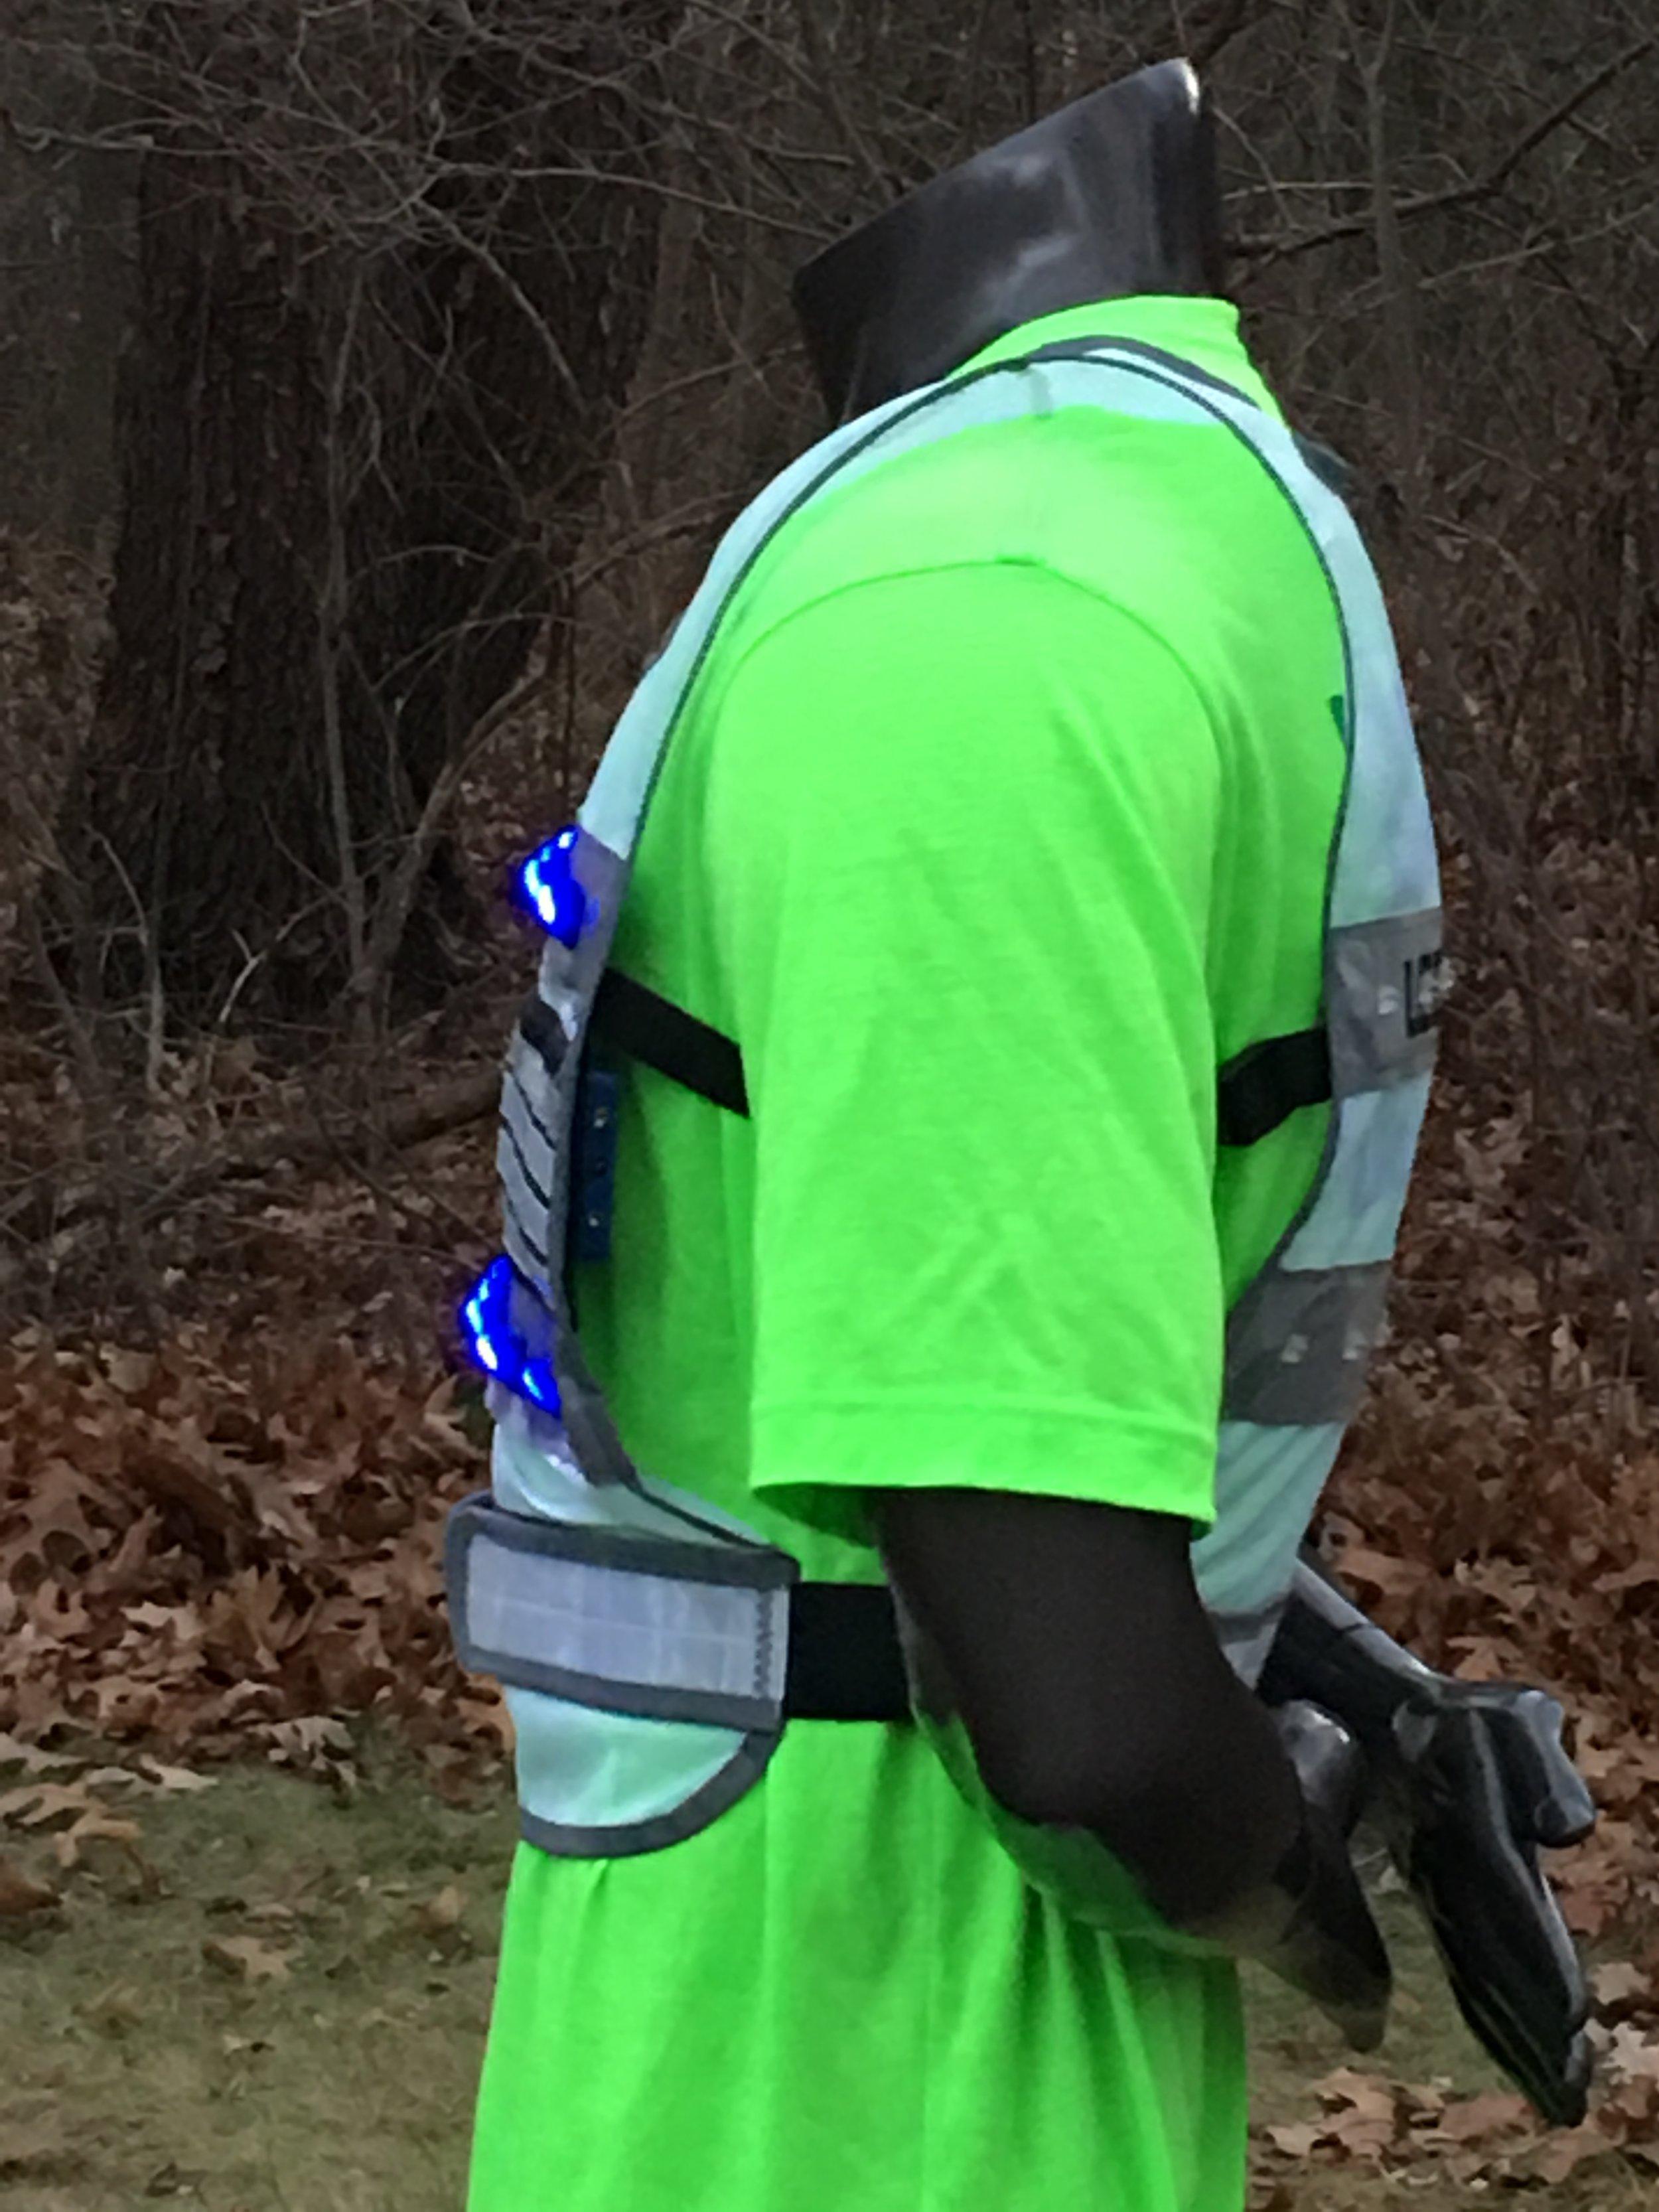 LEDLightVest-strap-safety-vest-experts----Grand Rapids-MI.JPG